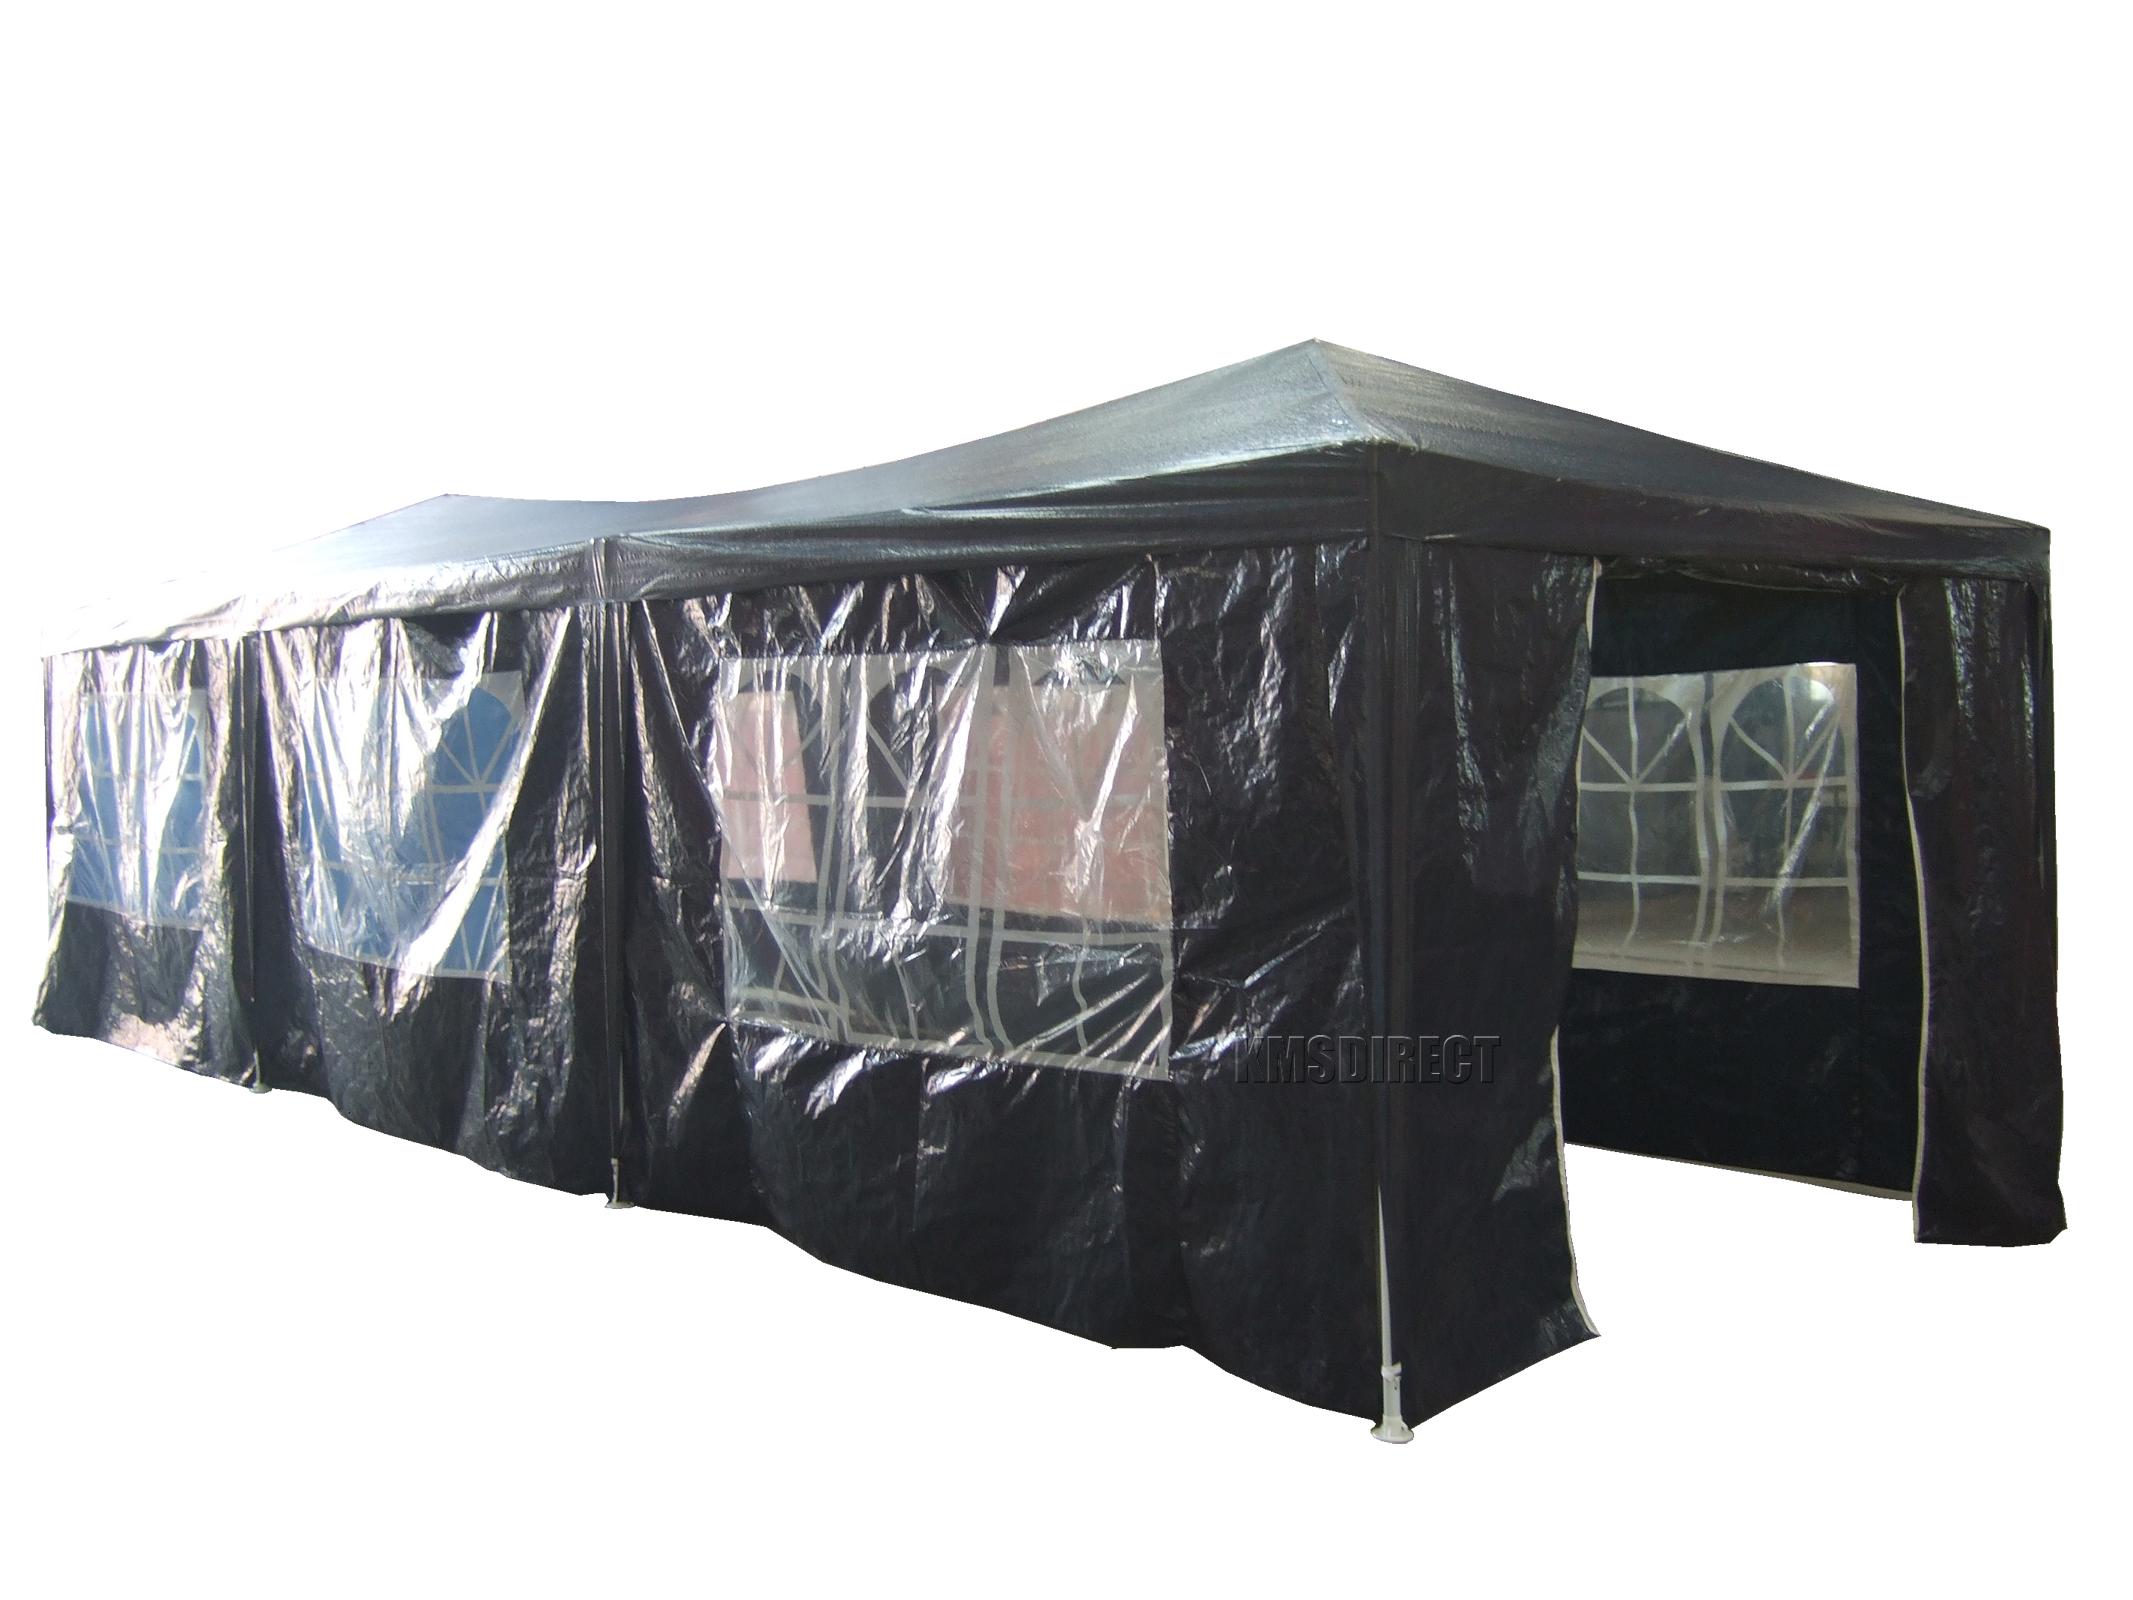 FoxHunter 3M x 3M 4M 6M 9M PE Gazebo Waterproof Garden